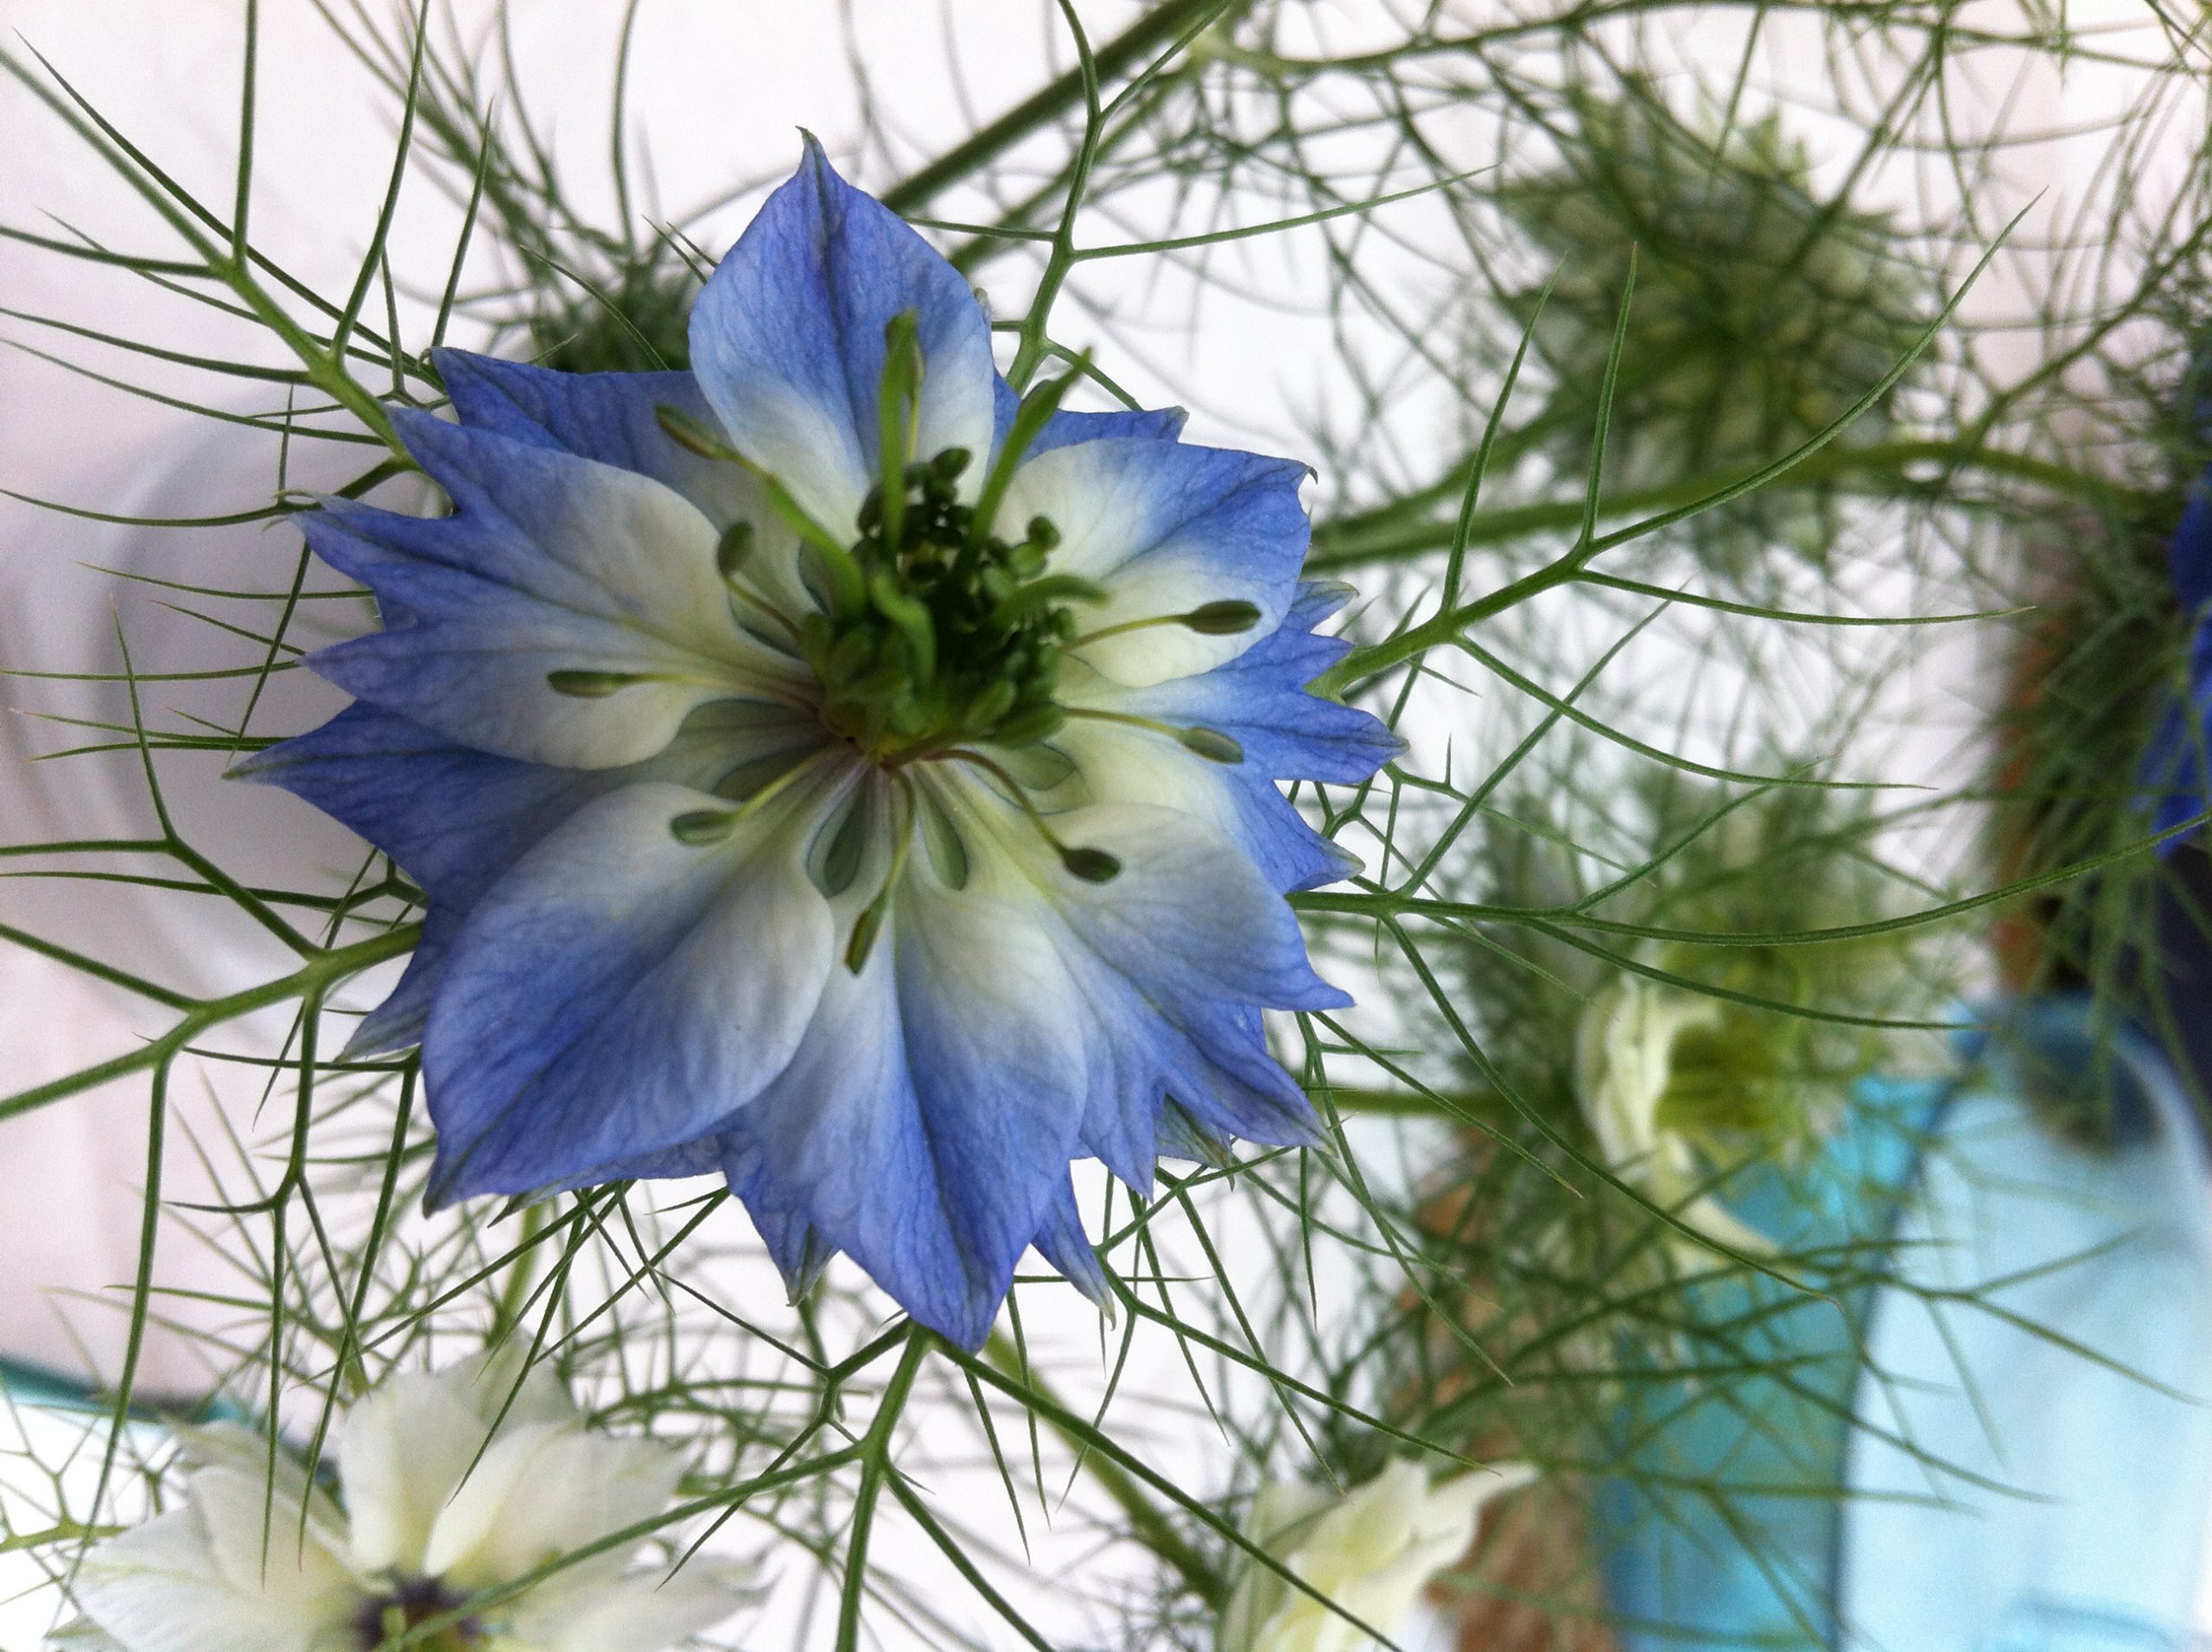 Plant-based passion